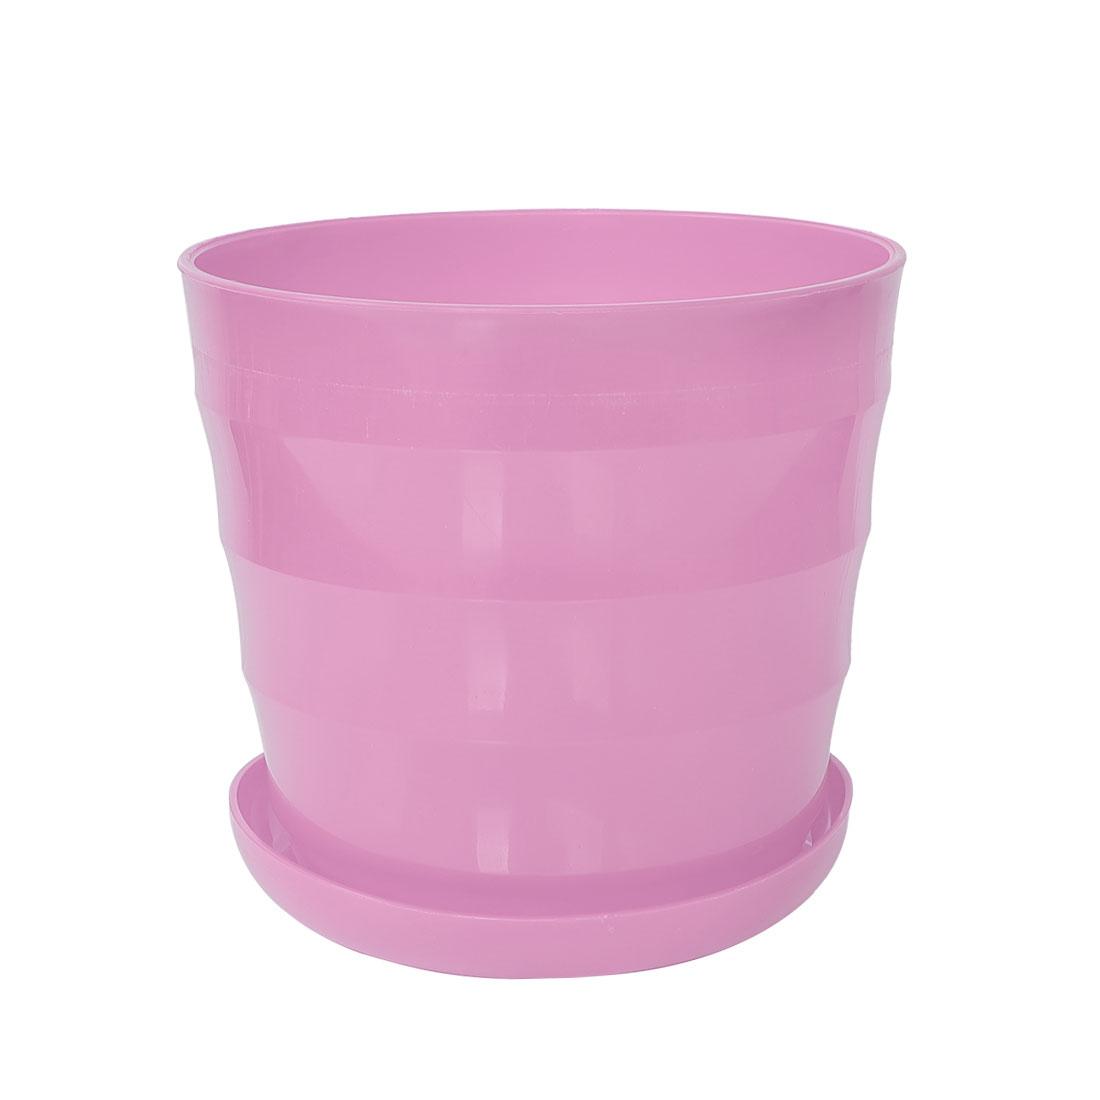 Home Garden Office Plastic Round Plant Planter Flower Pot Ornament Pink